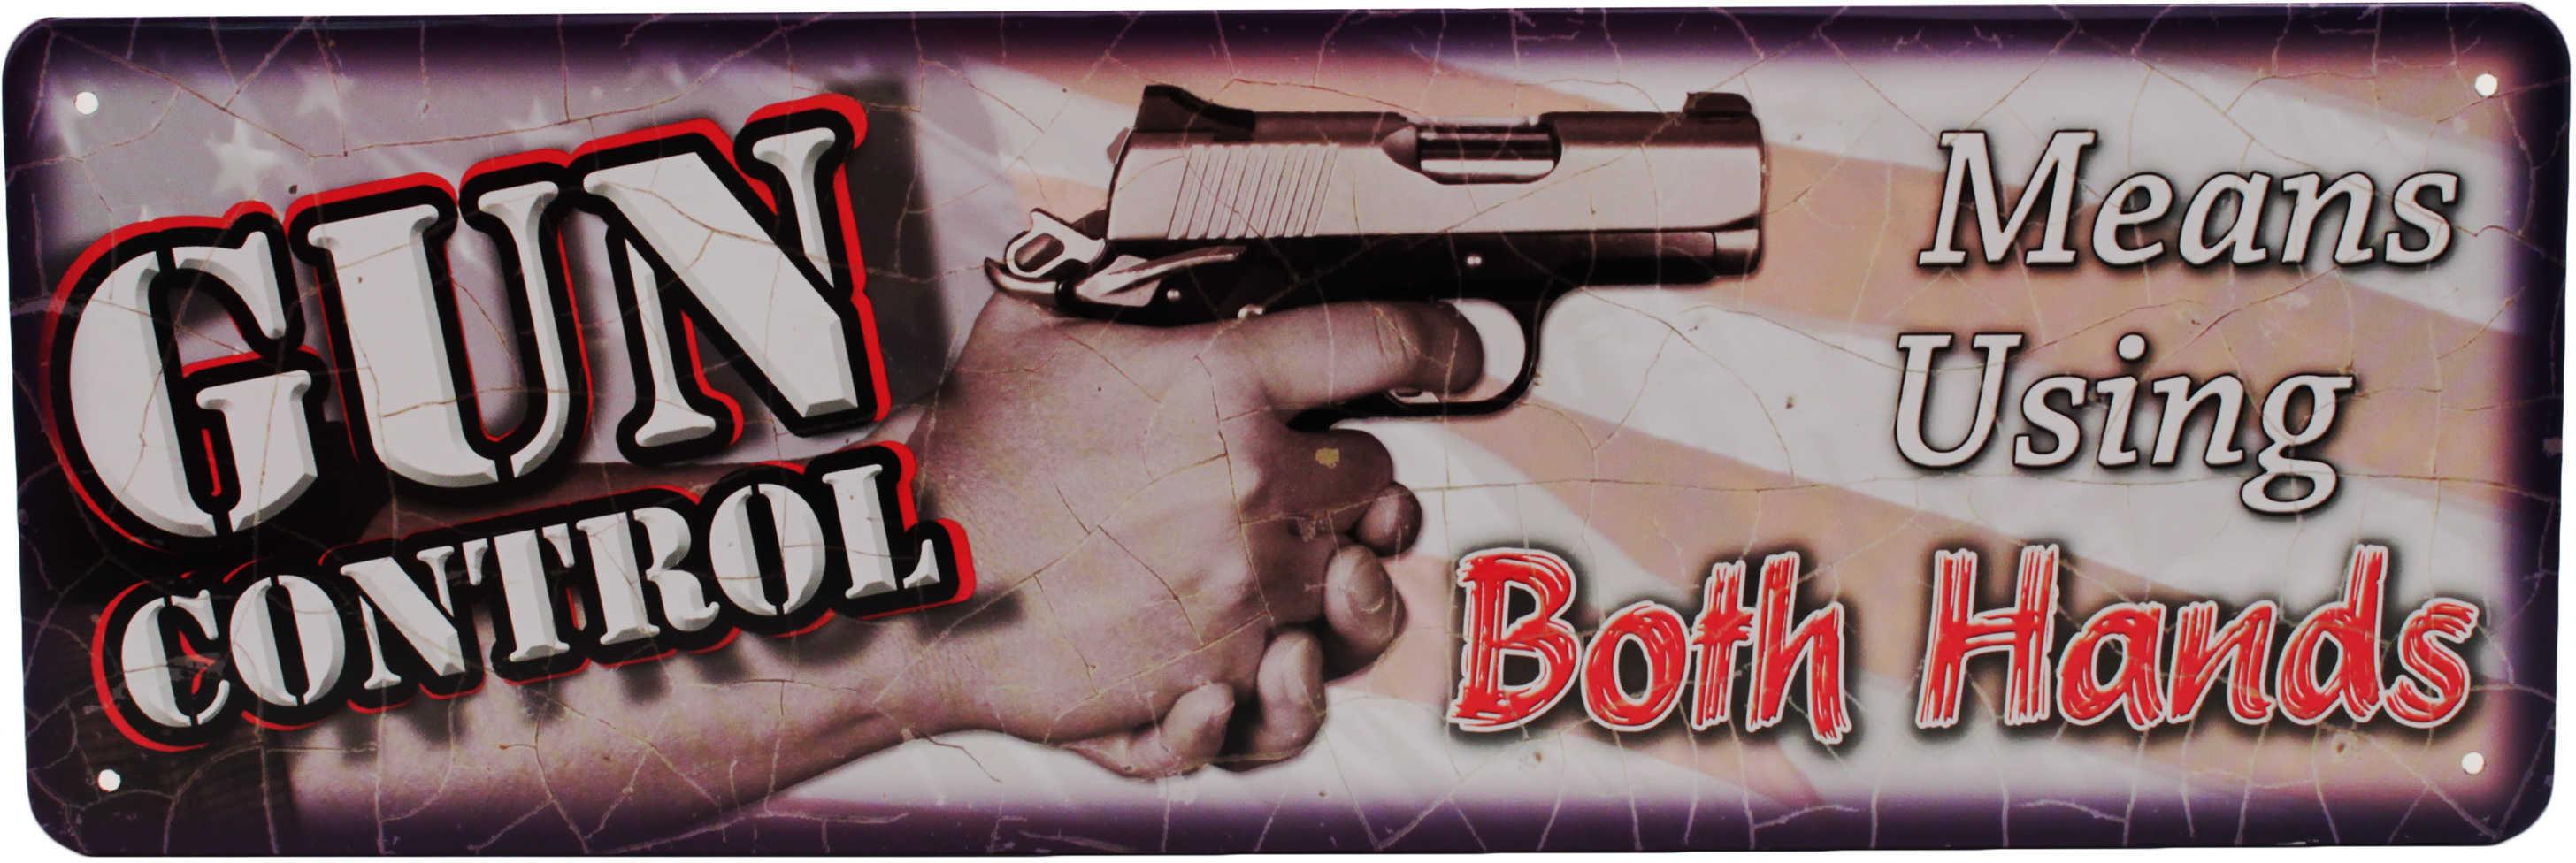 "Rivers Edge Products 10.5"" x 3.5"" Tin Sign Gun Control Both Hands 1411"